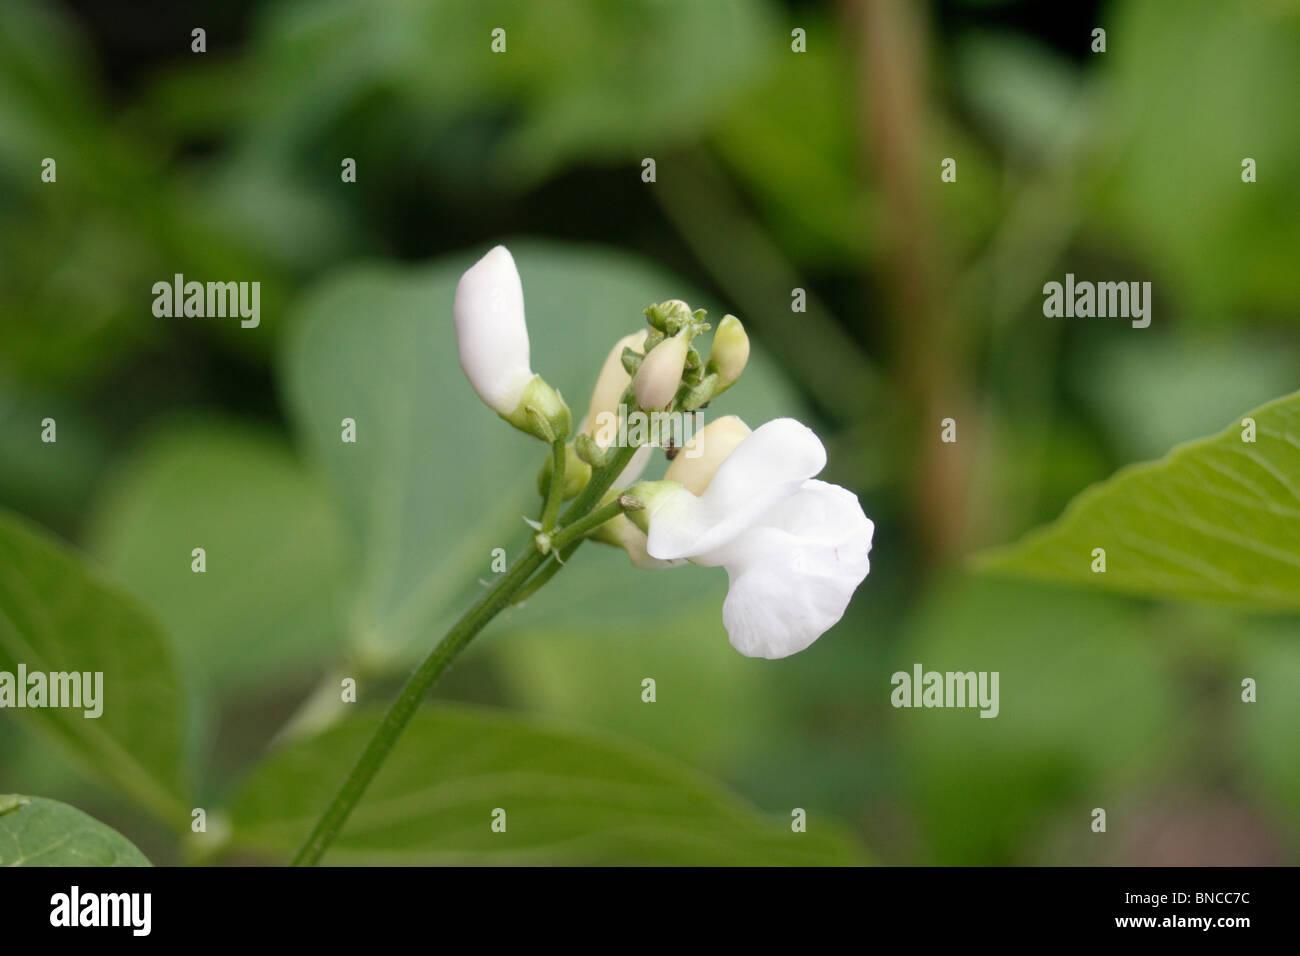 Runner bean plant, Phaseolus coccineus, unusual for Runner beans in that this one has white flowers. Emergo Stringless - Stock Image